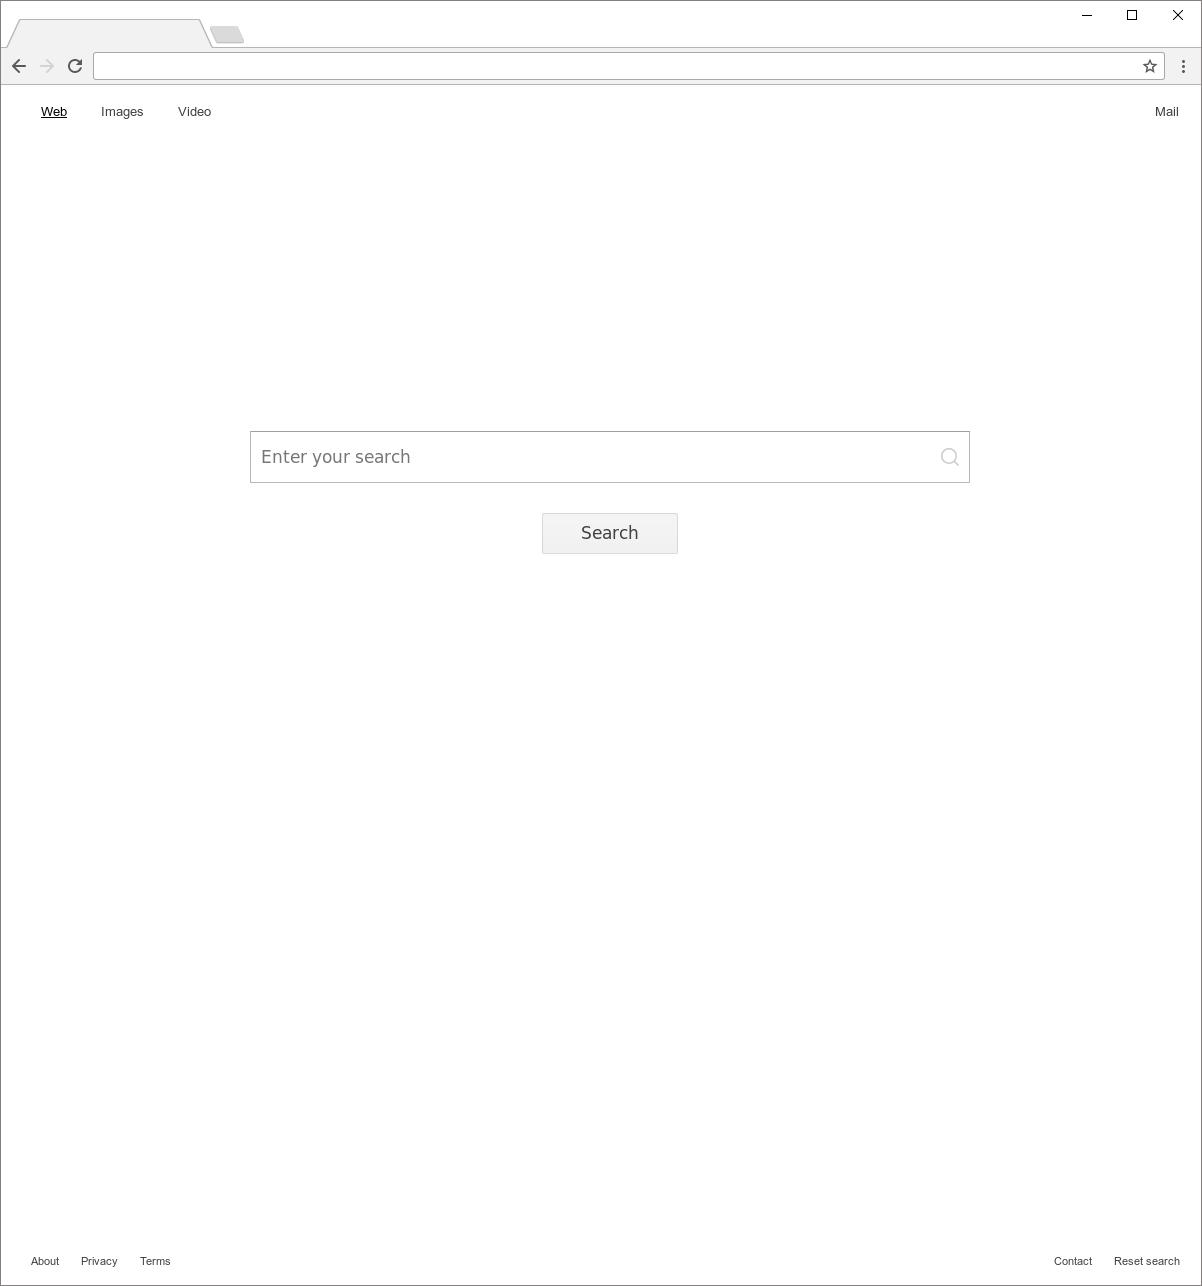 Go.bonanzoro.com Hijacker